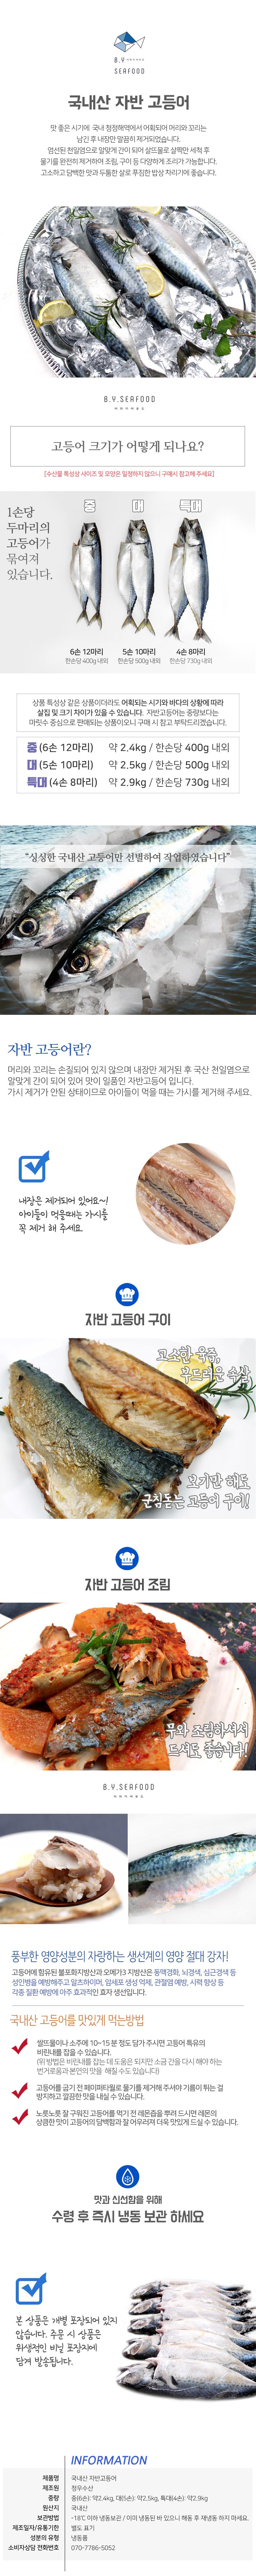 st_mackerel.jpg